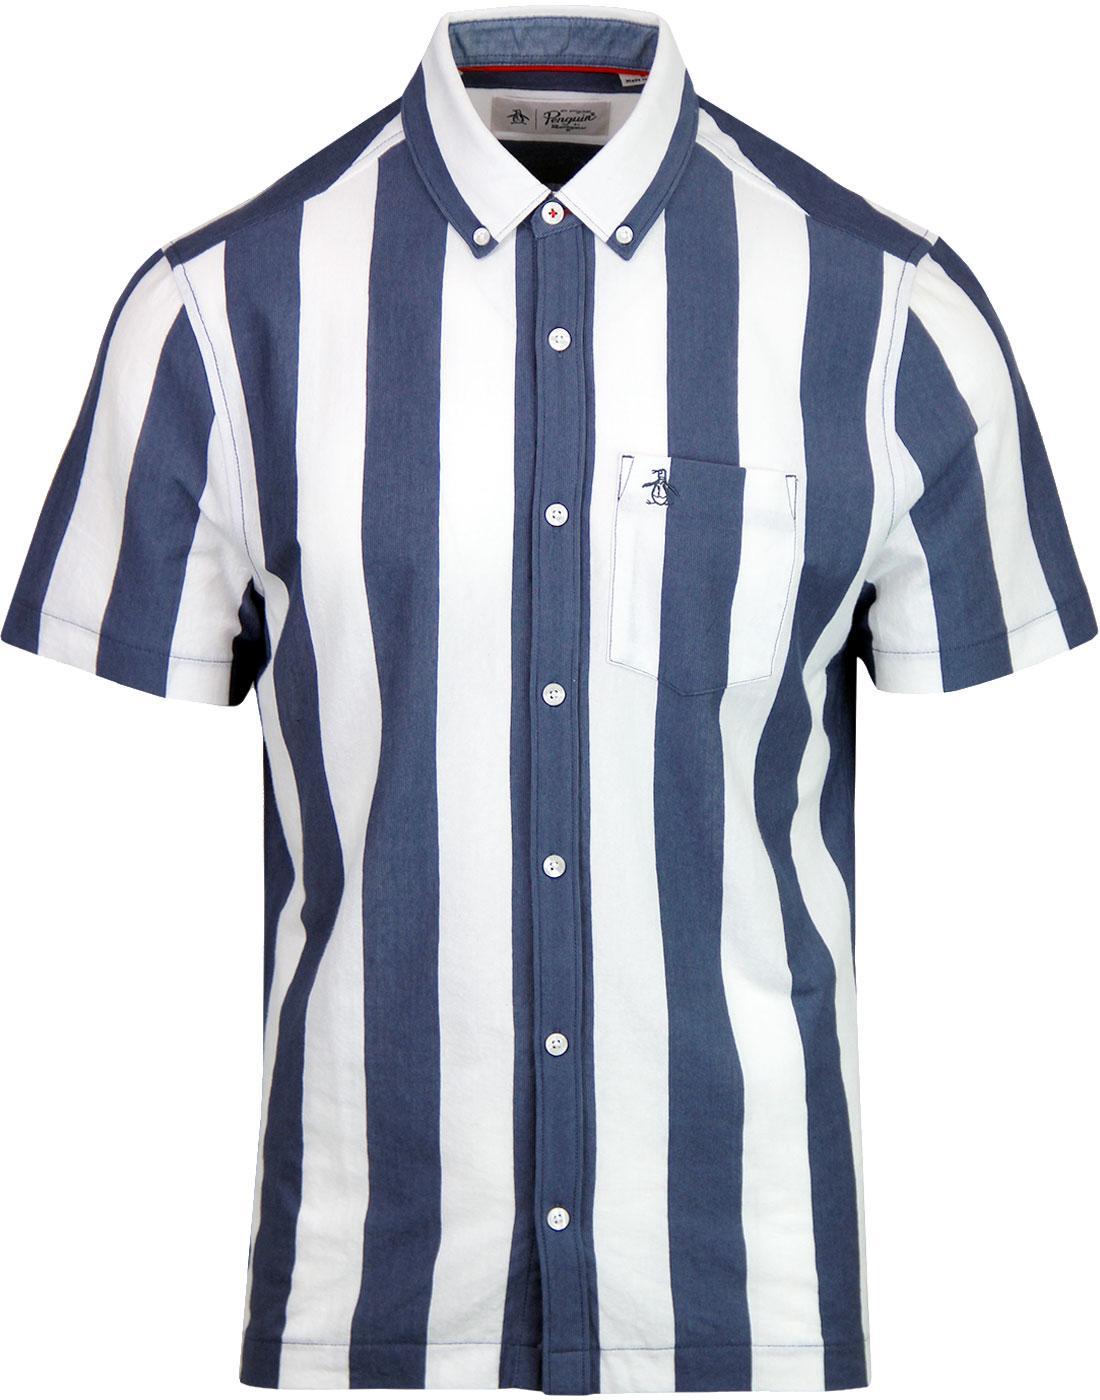 ORIGINAL PENGUIN Knitted Vertical Stripe Mod Shirt